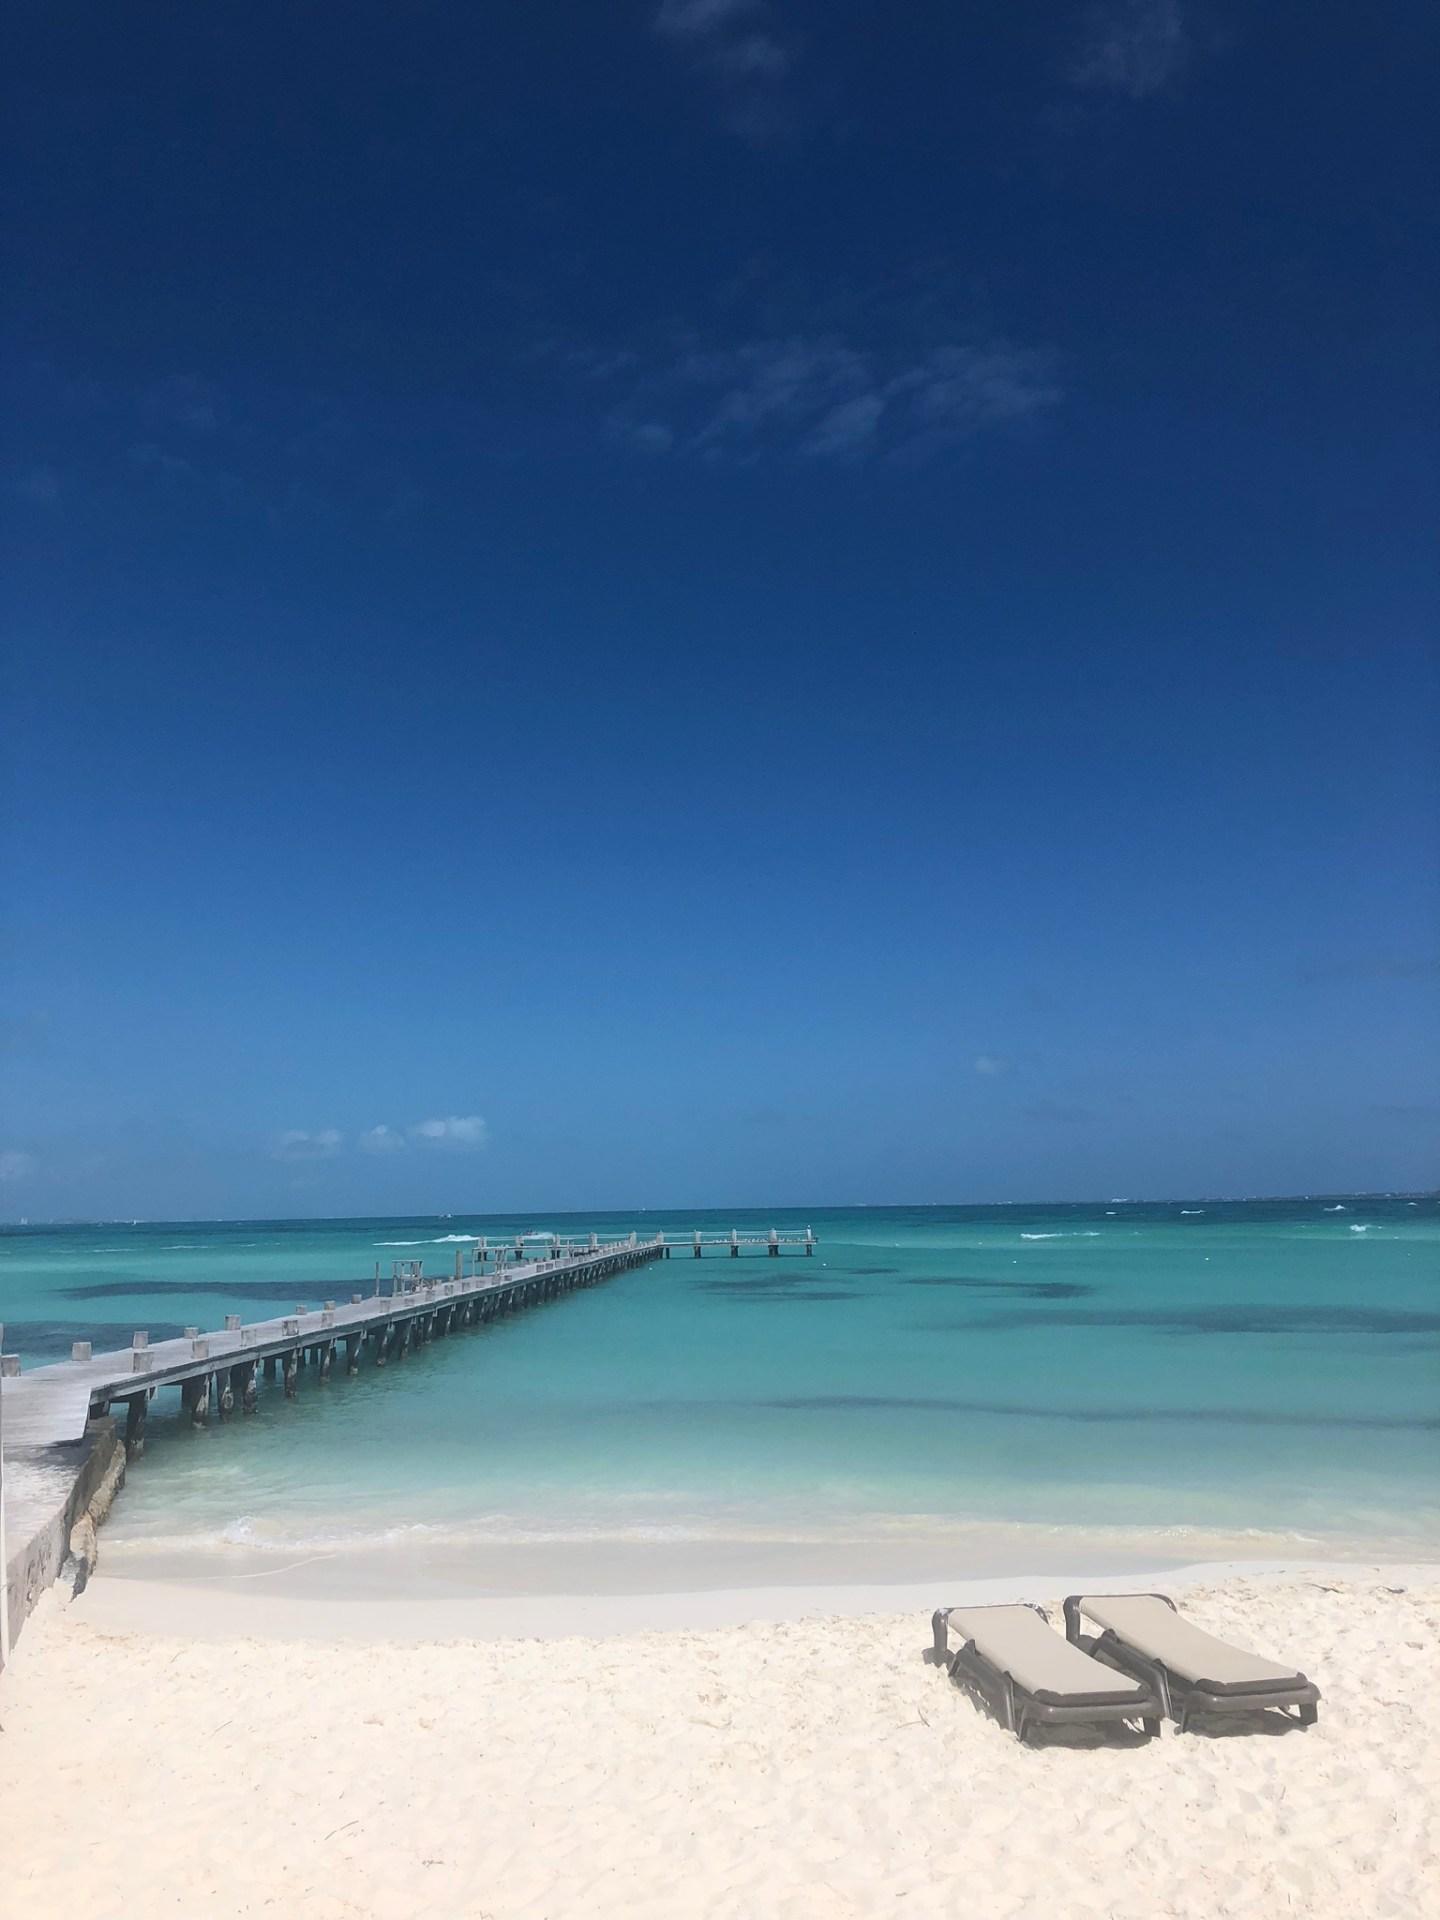 Cancun beach, Mexico at Hotel Ziva